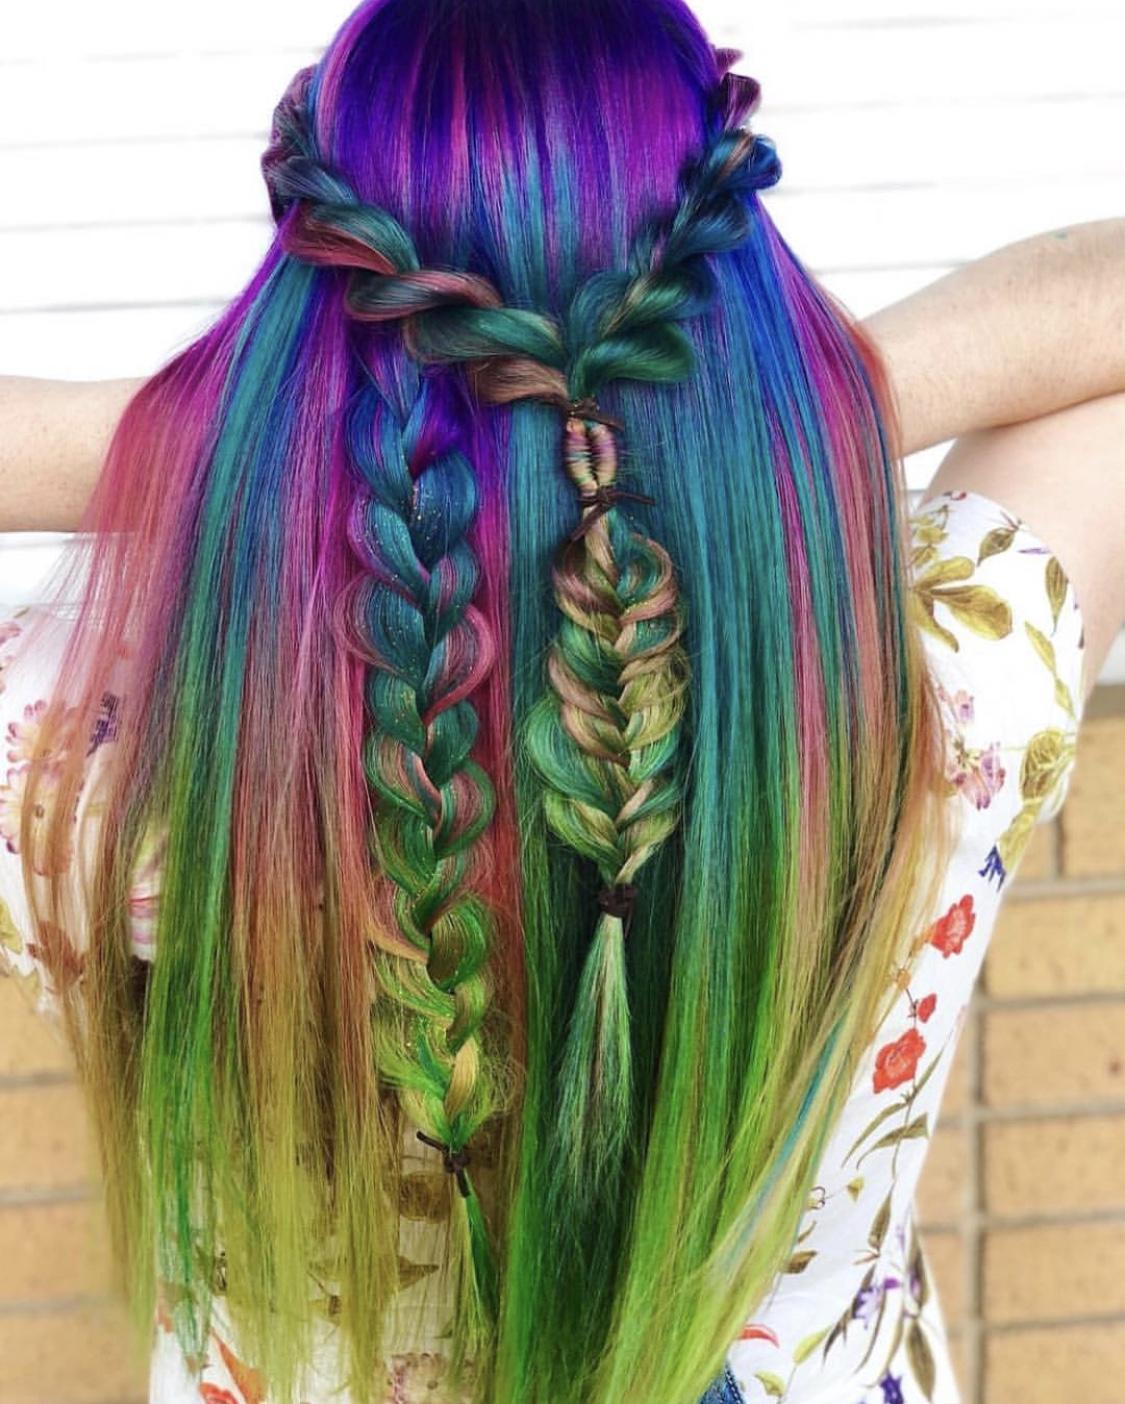 A braided, boho rainbow creation by Sydney Lopez.